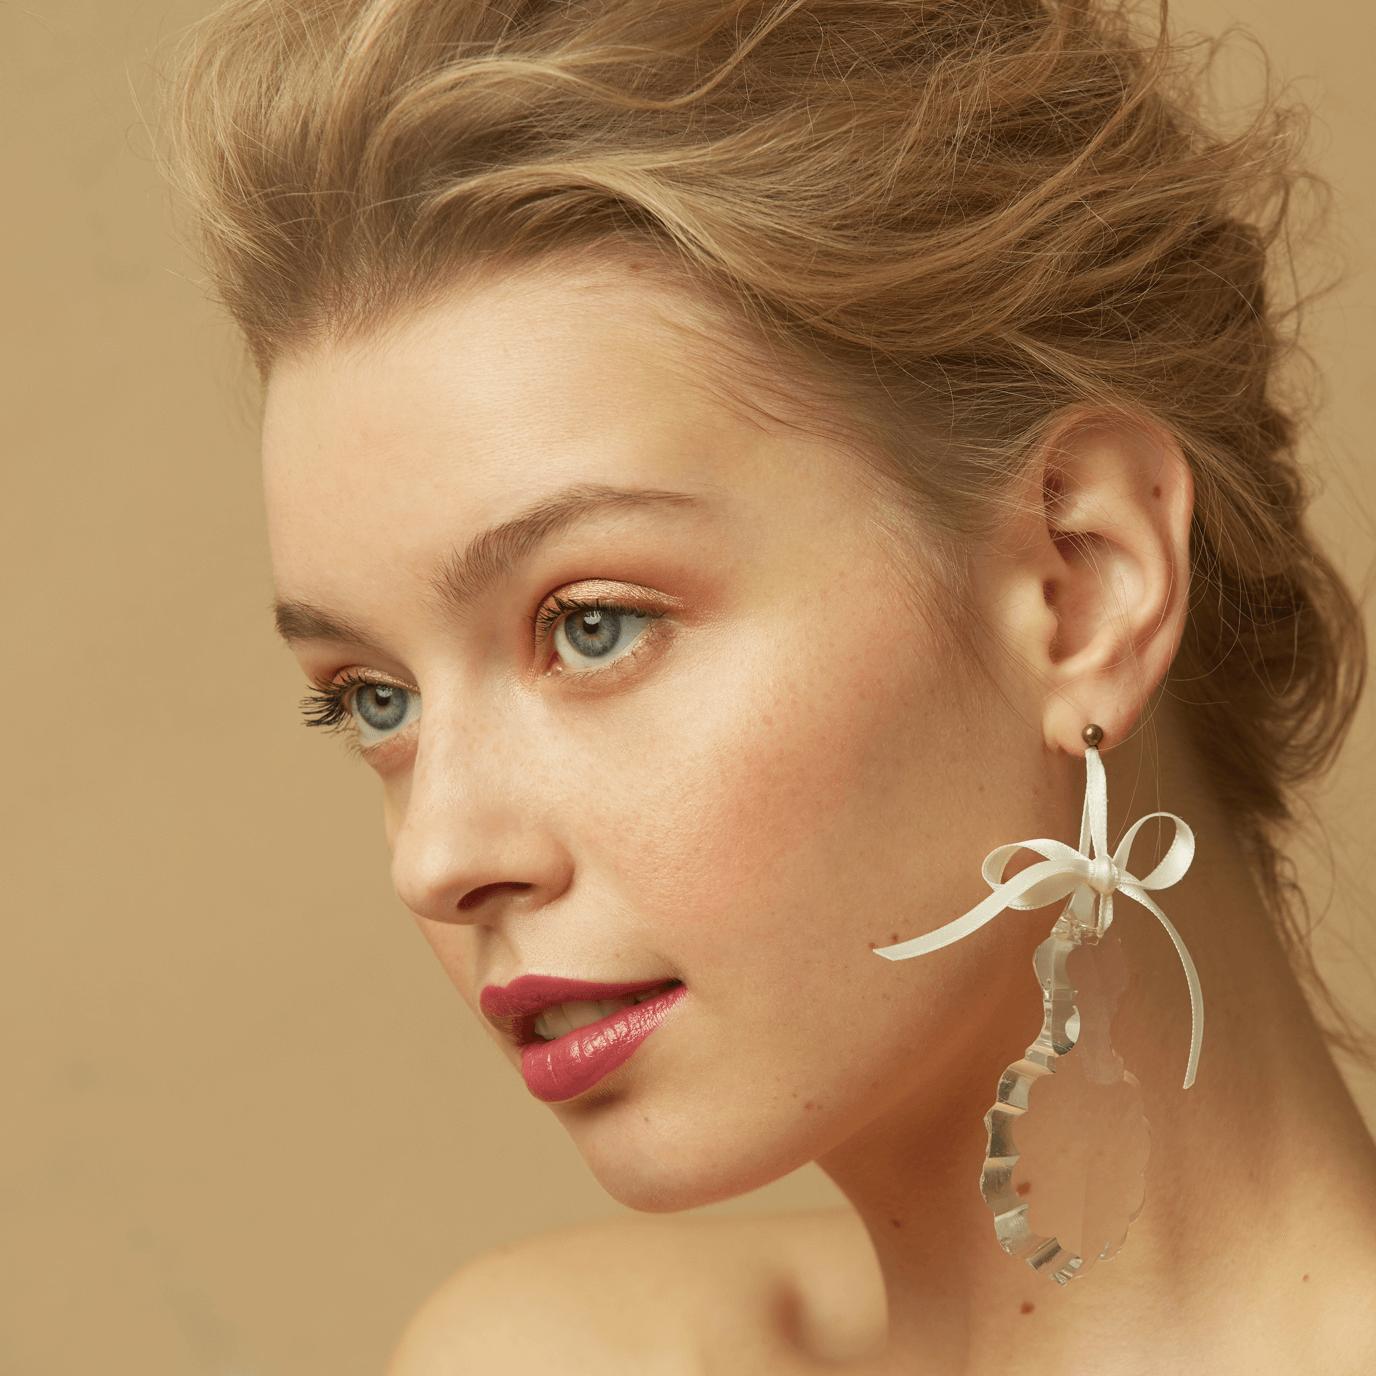 foto de belleza con retoque fotografico profesional madrid